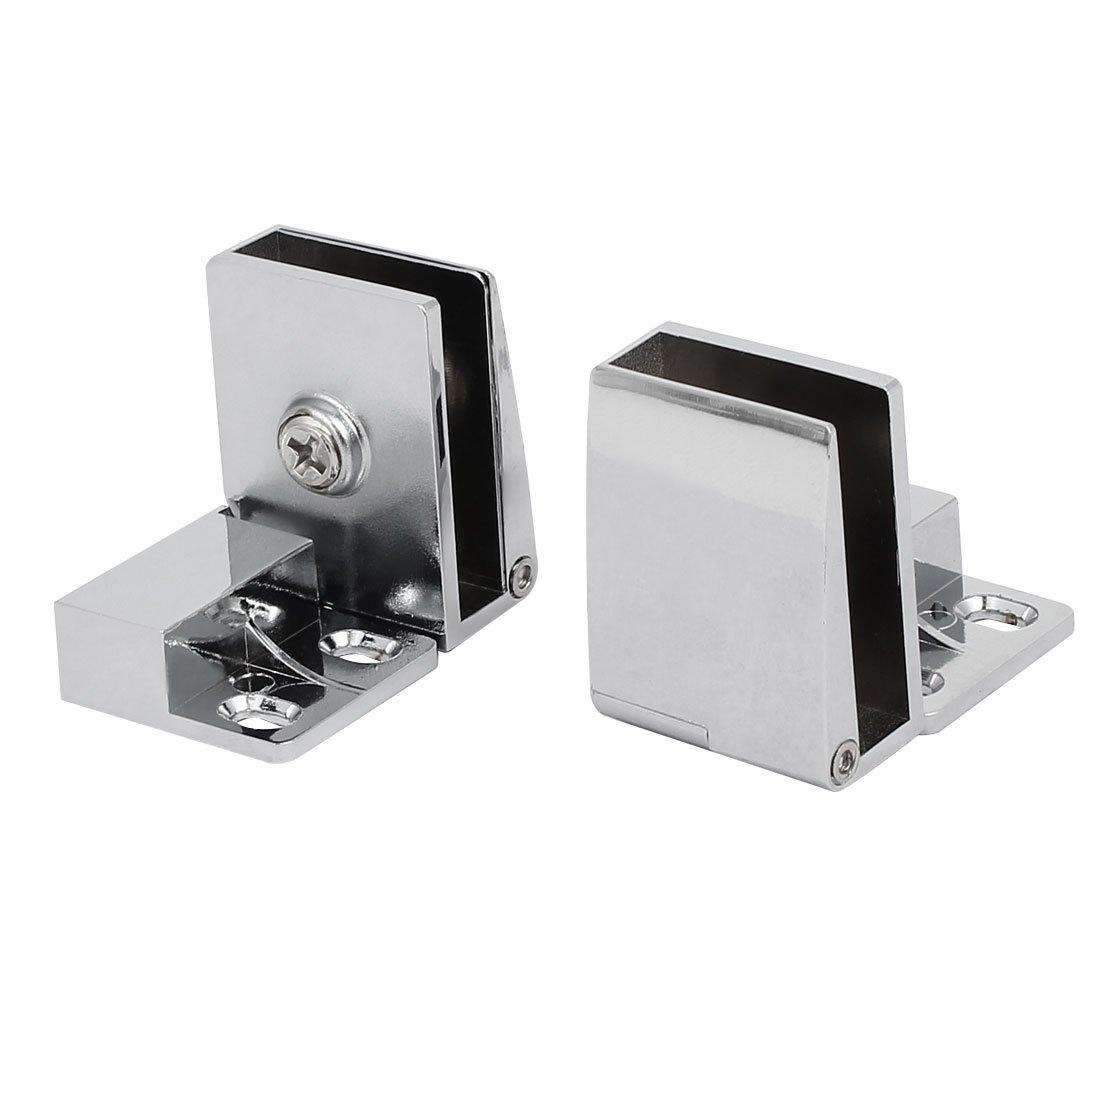 sourcingmap® Bisagras Abrazaderas de metal satinado 3mm-5mm de espesor de pared para vidrio 2pcs a16120100ux0394